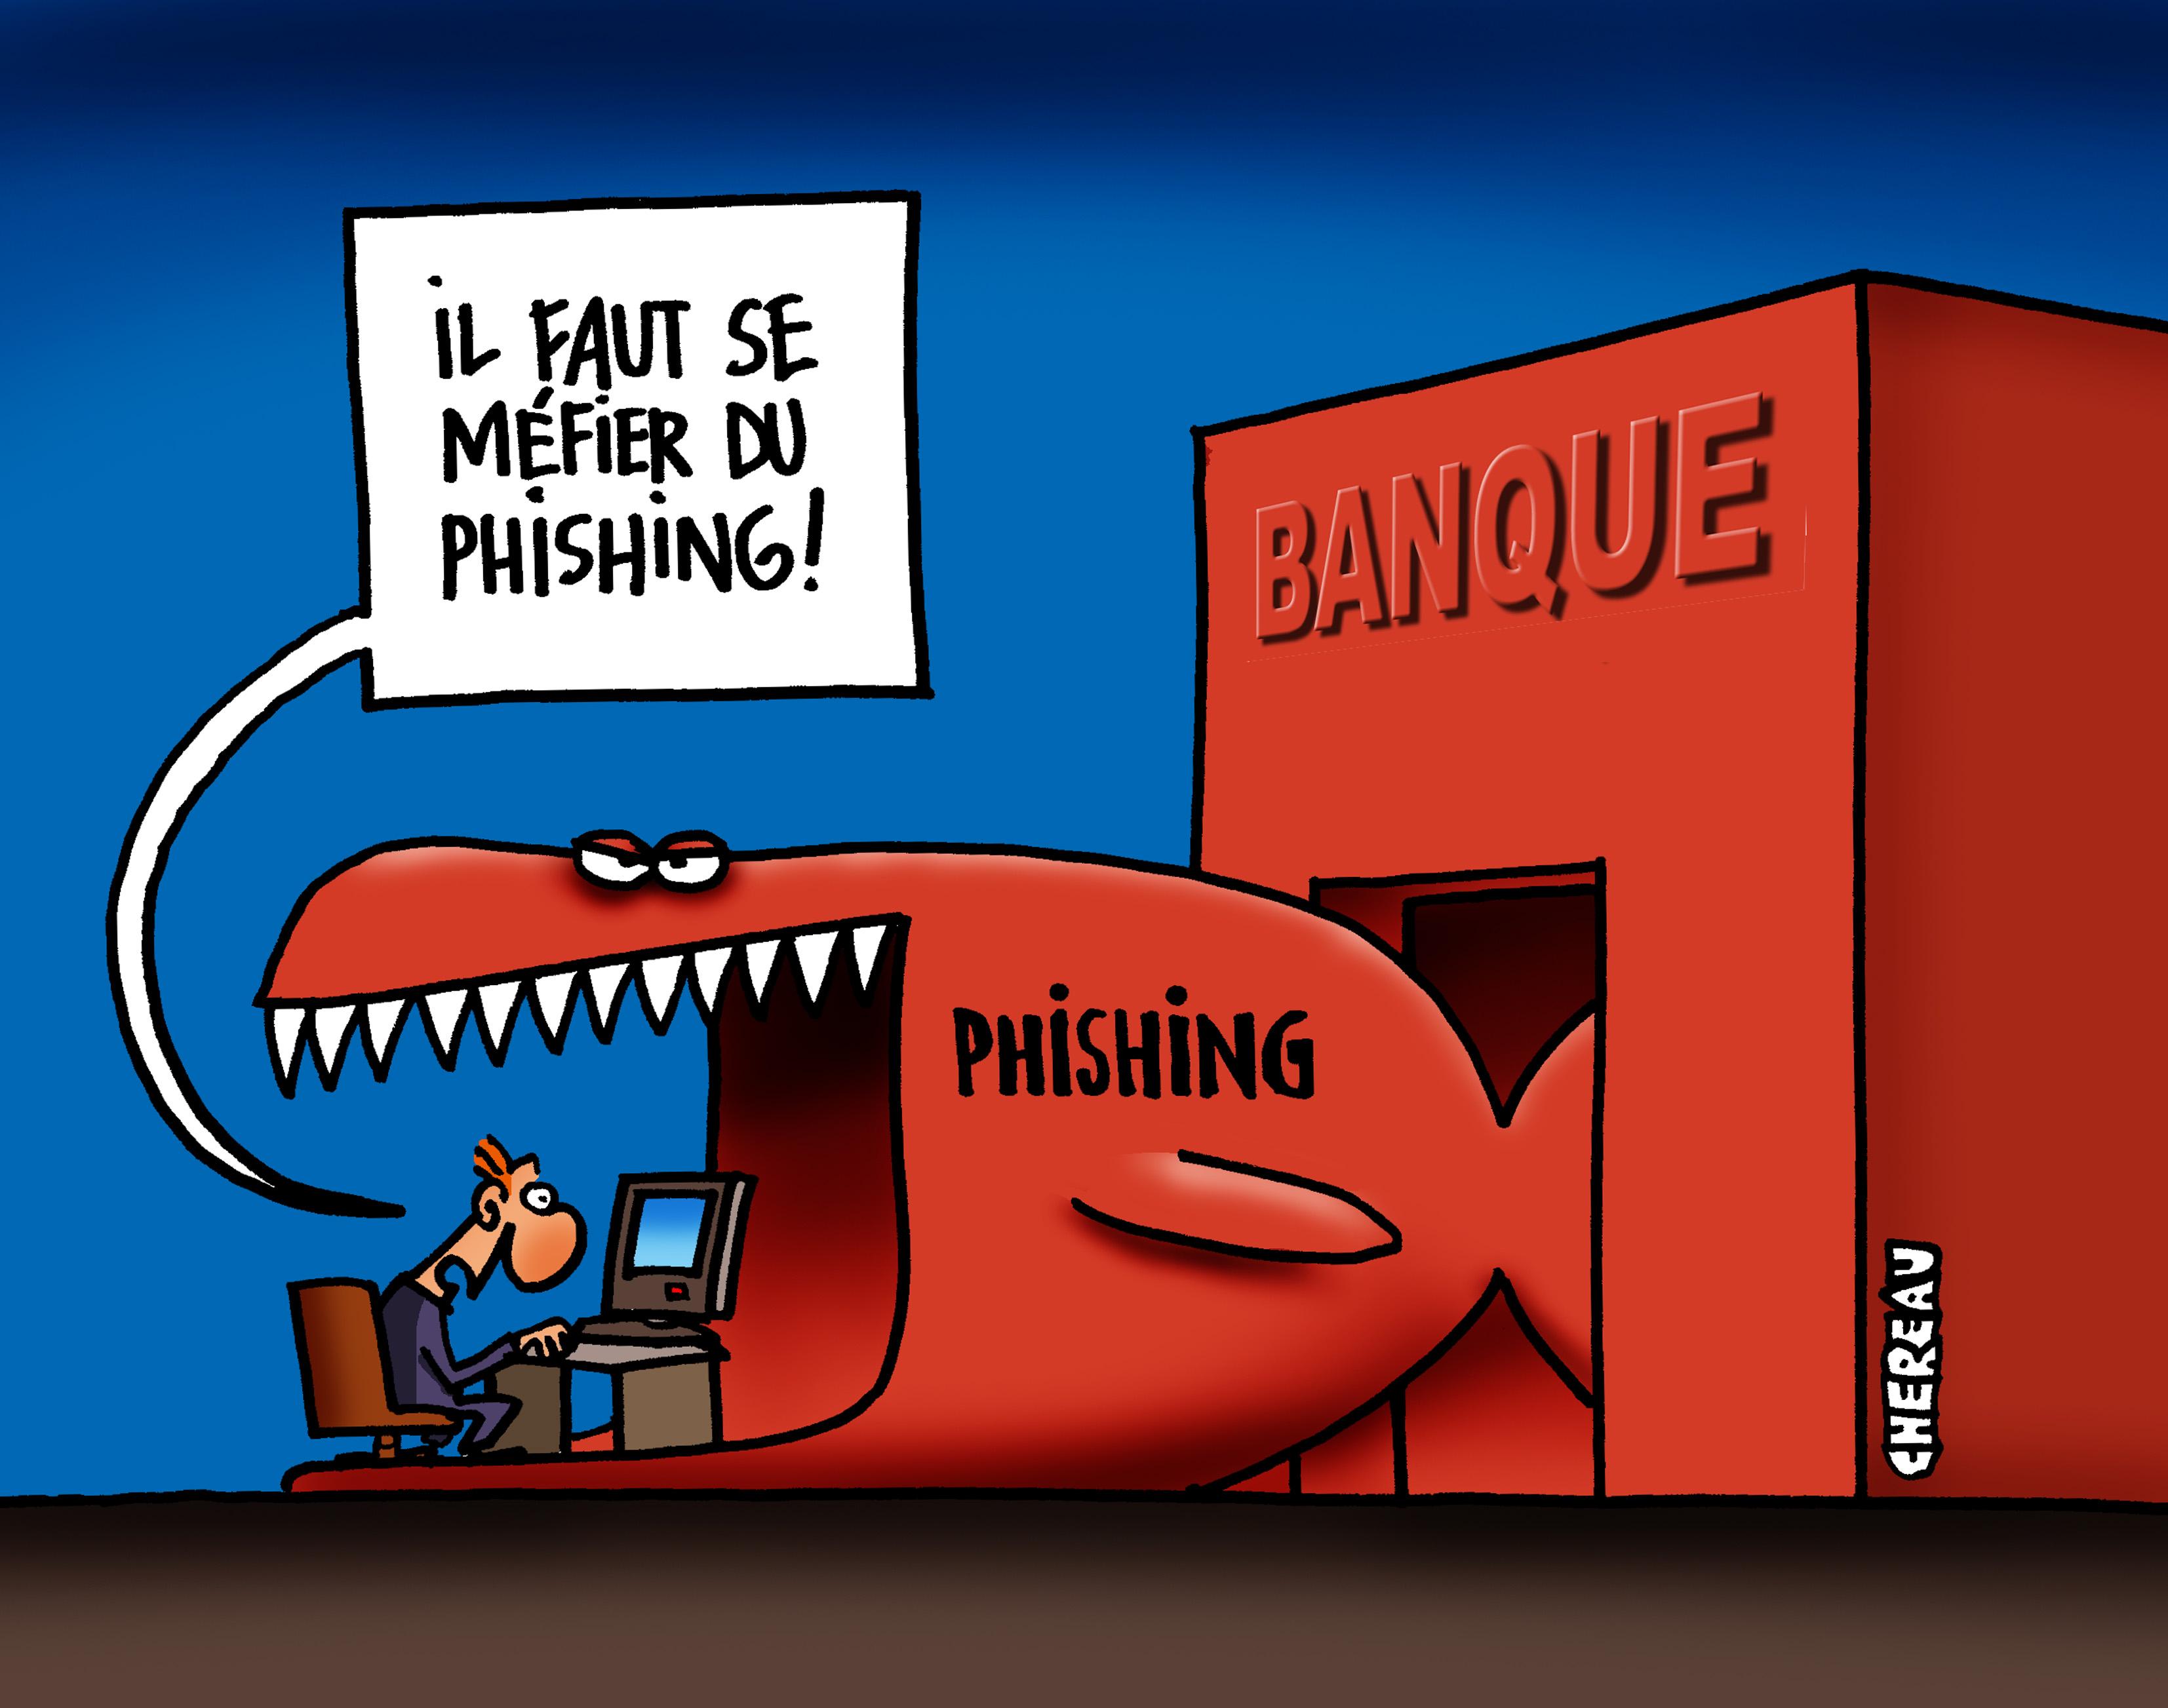 cnp-phishing.jpg